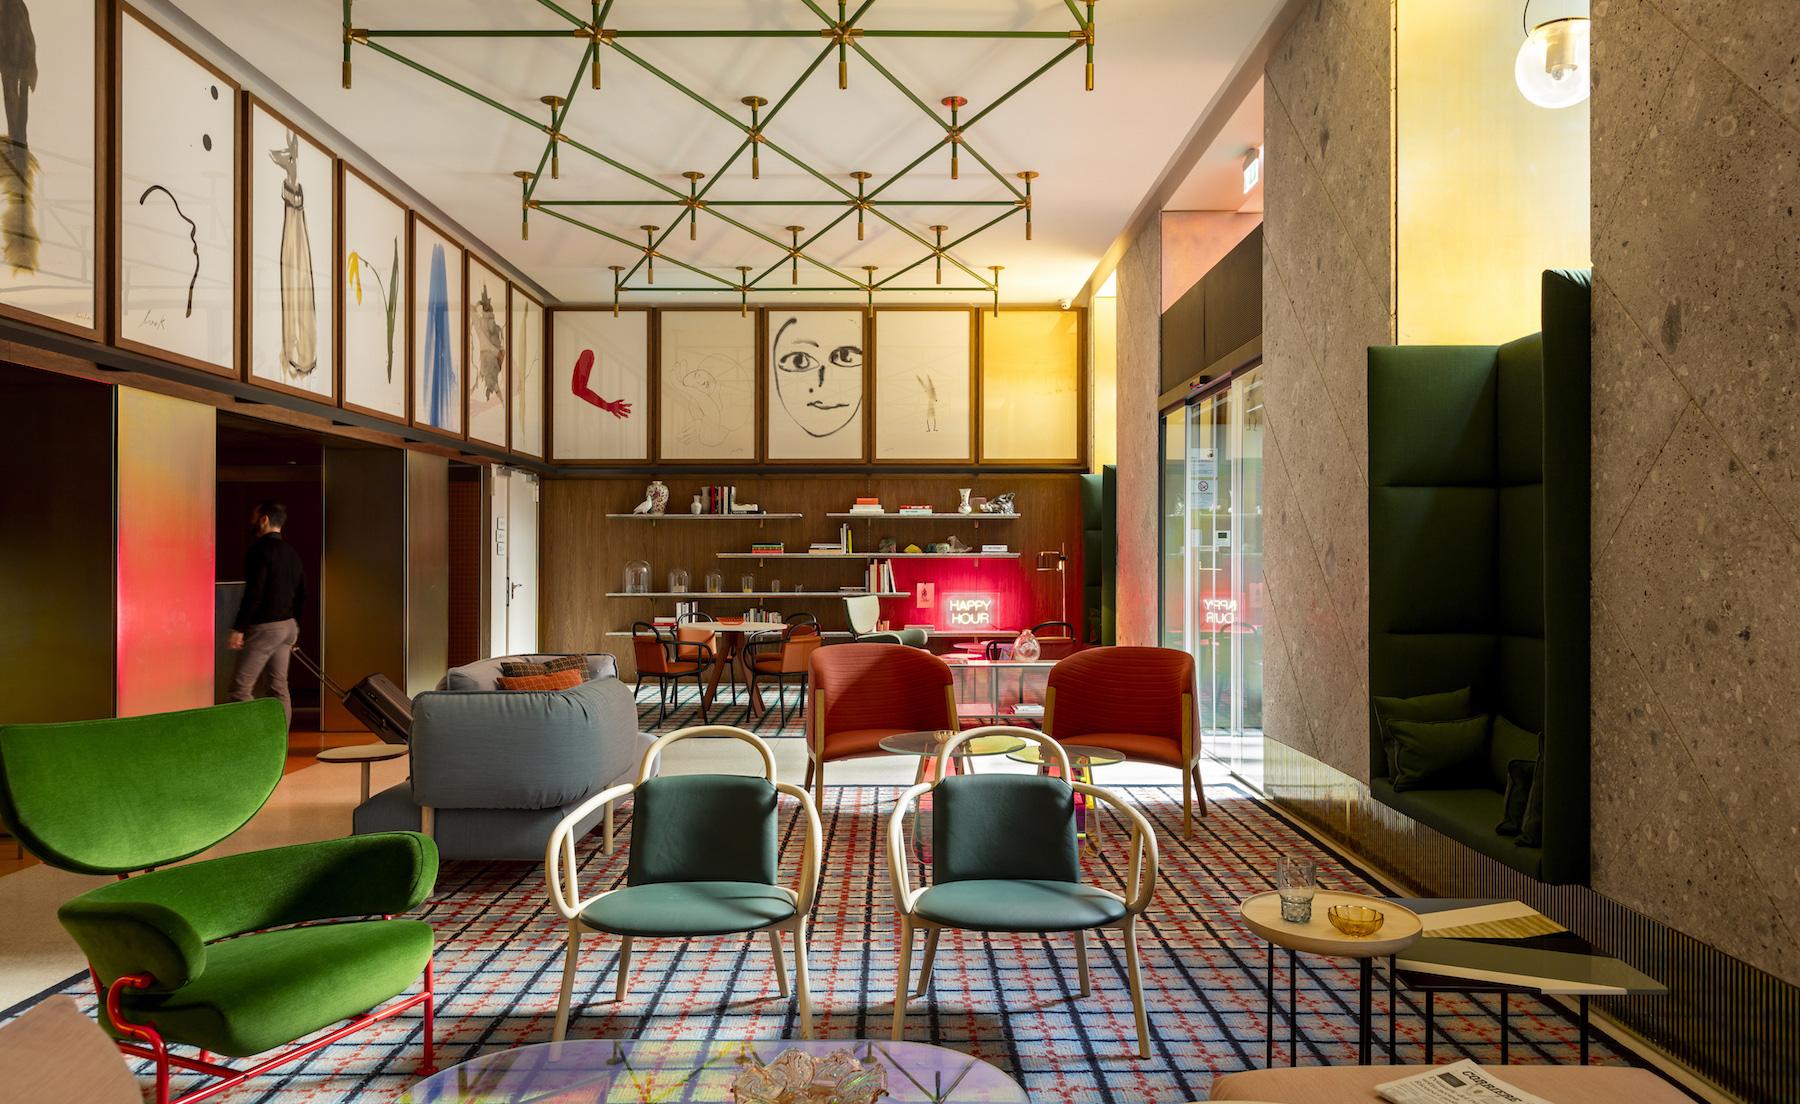 Hotel projektu Patricii Urquioli